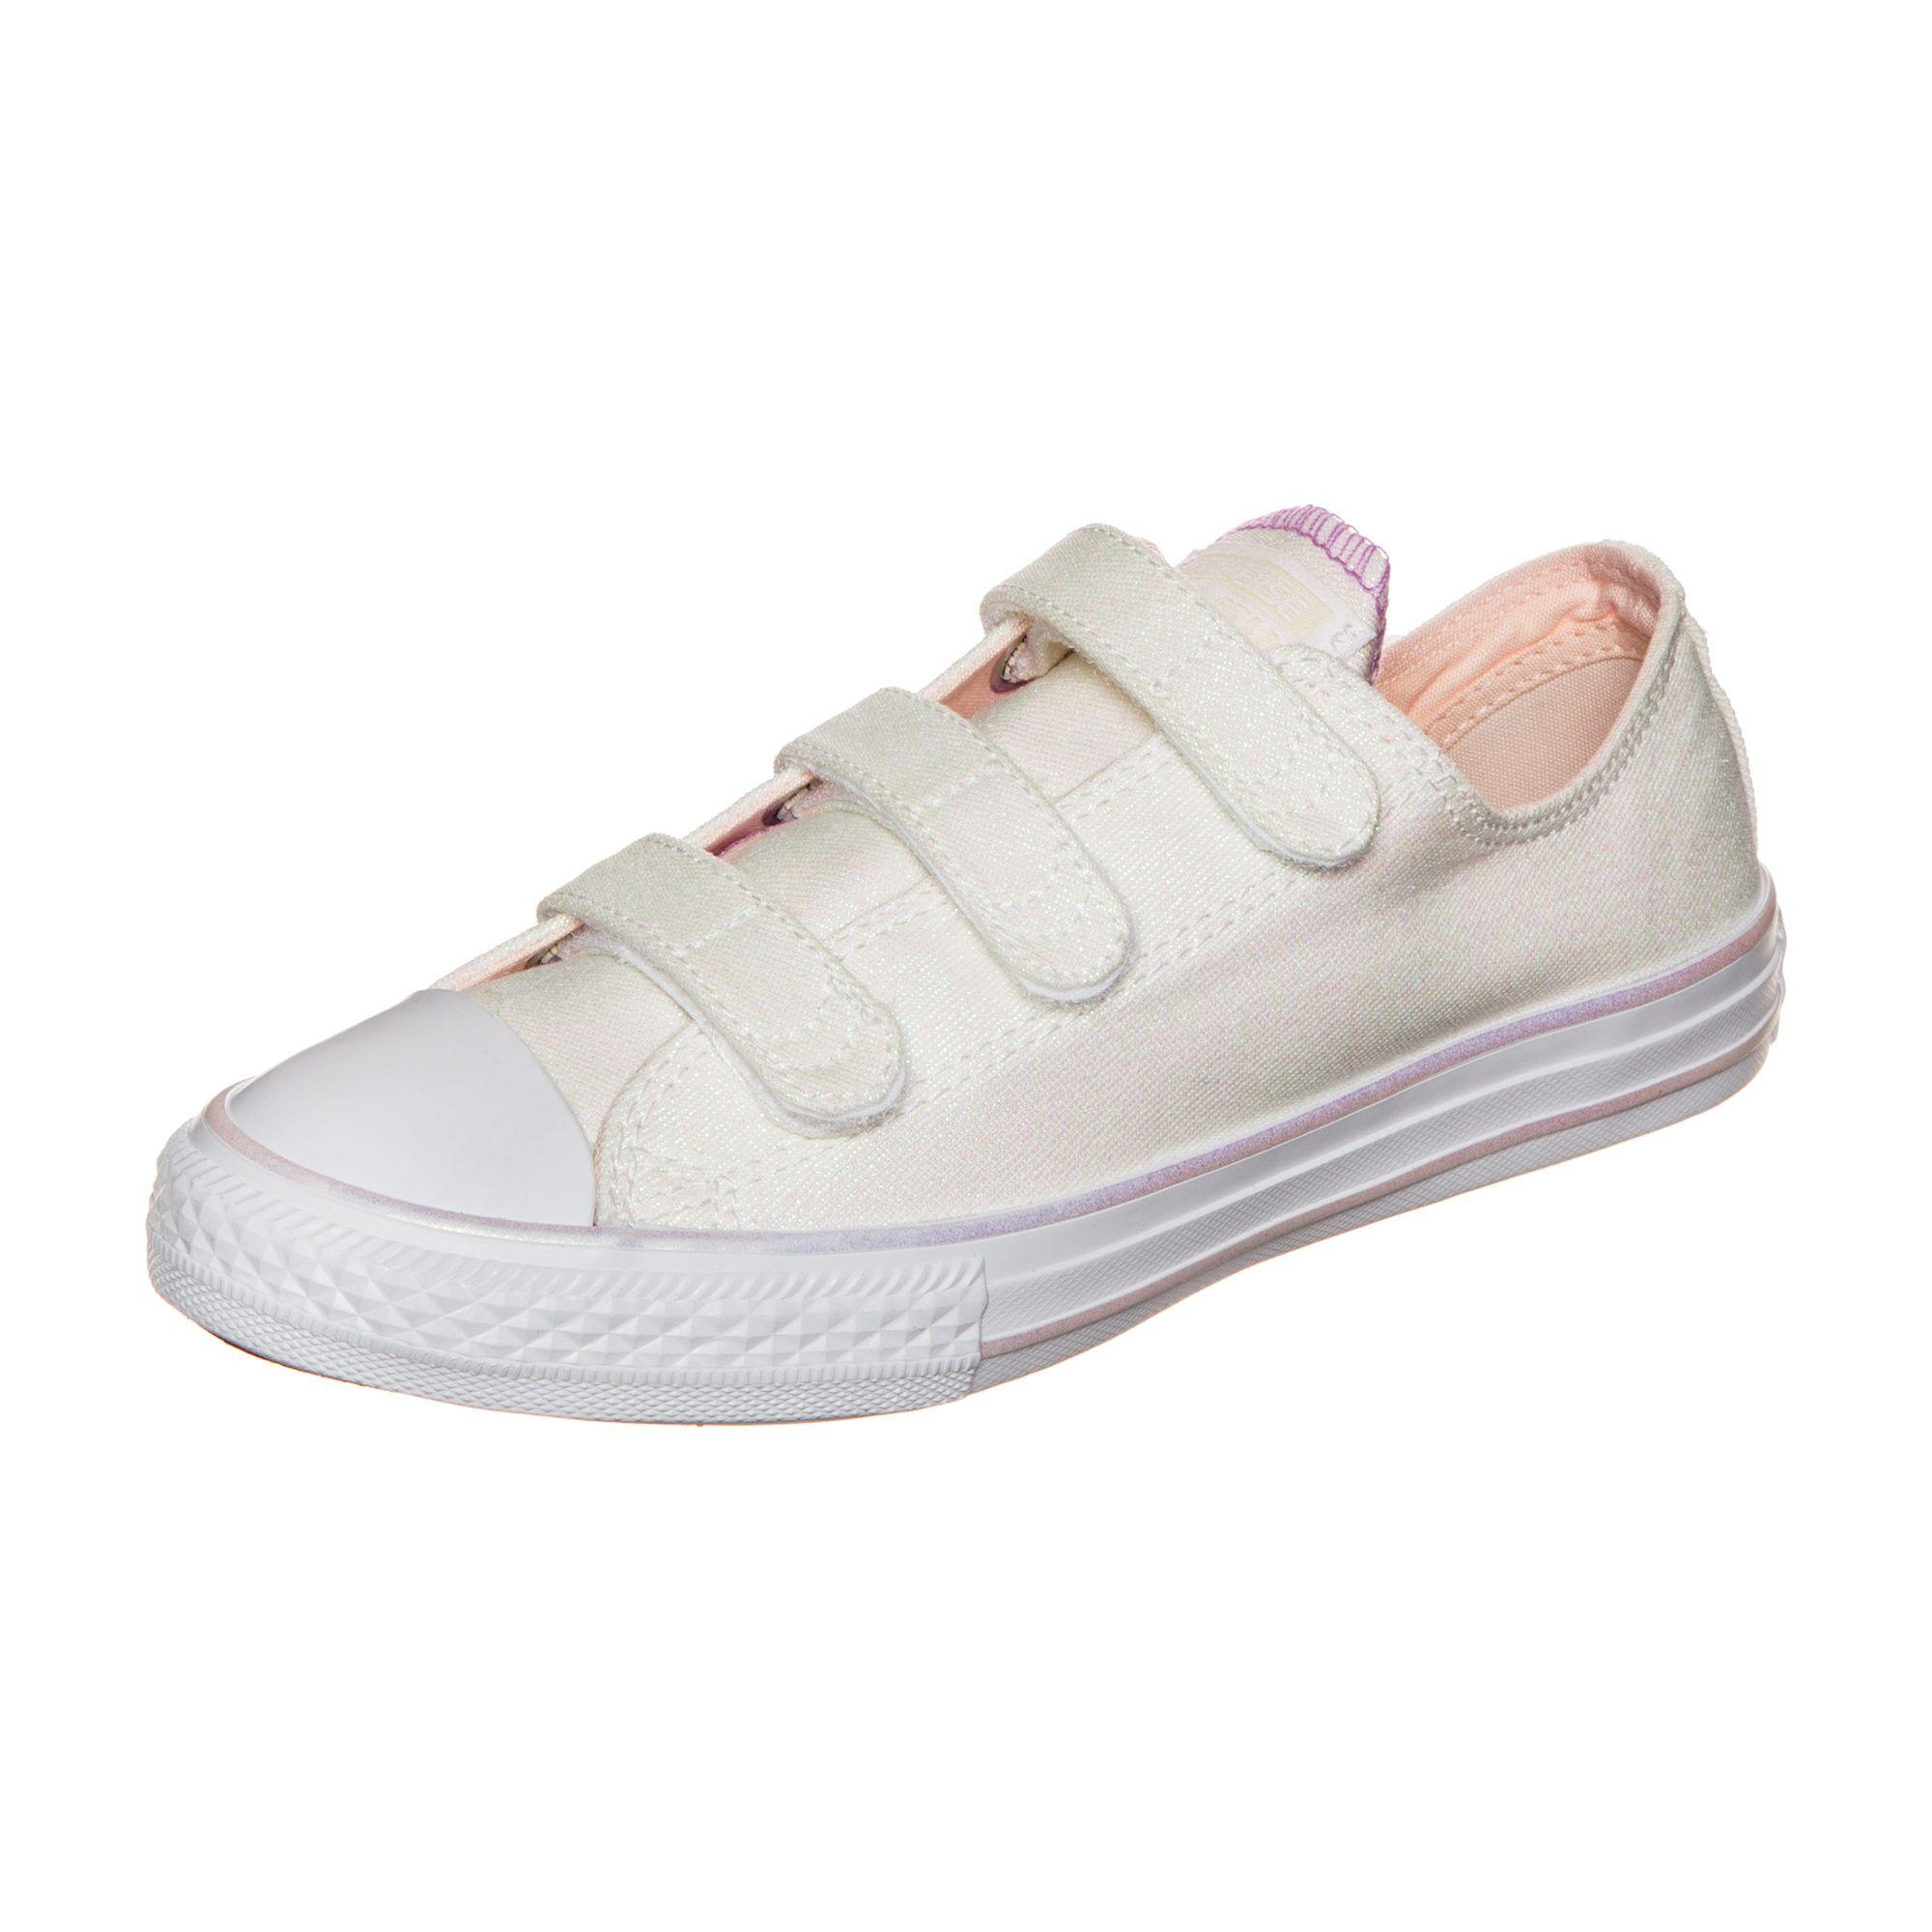 CONVERSE Converse Chuck Taylor All Star 3V OX Sneaker Kinder